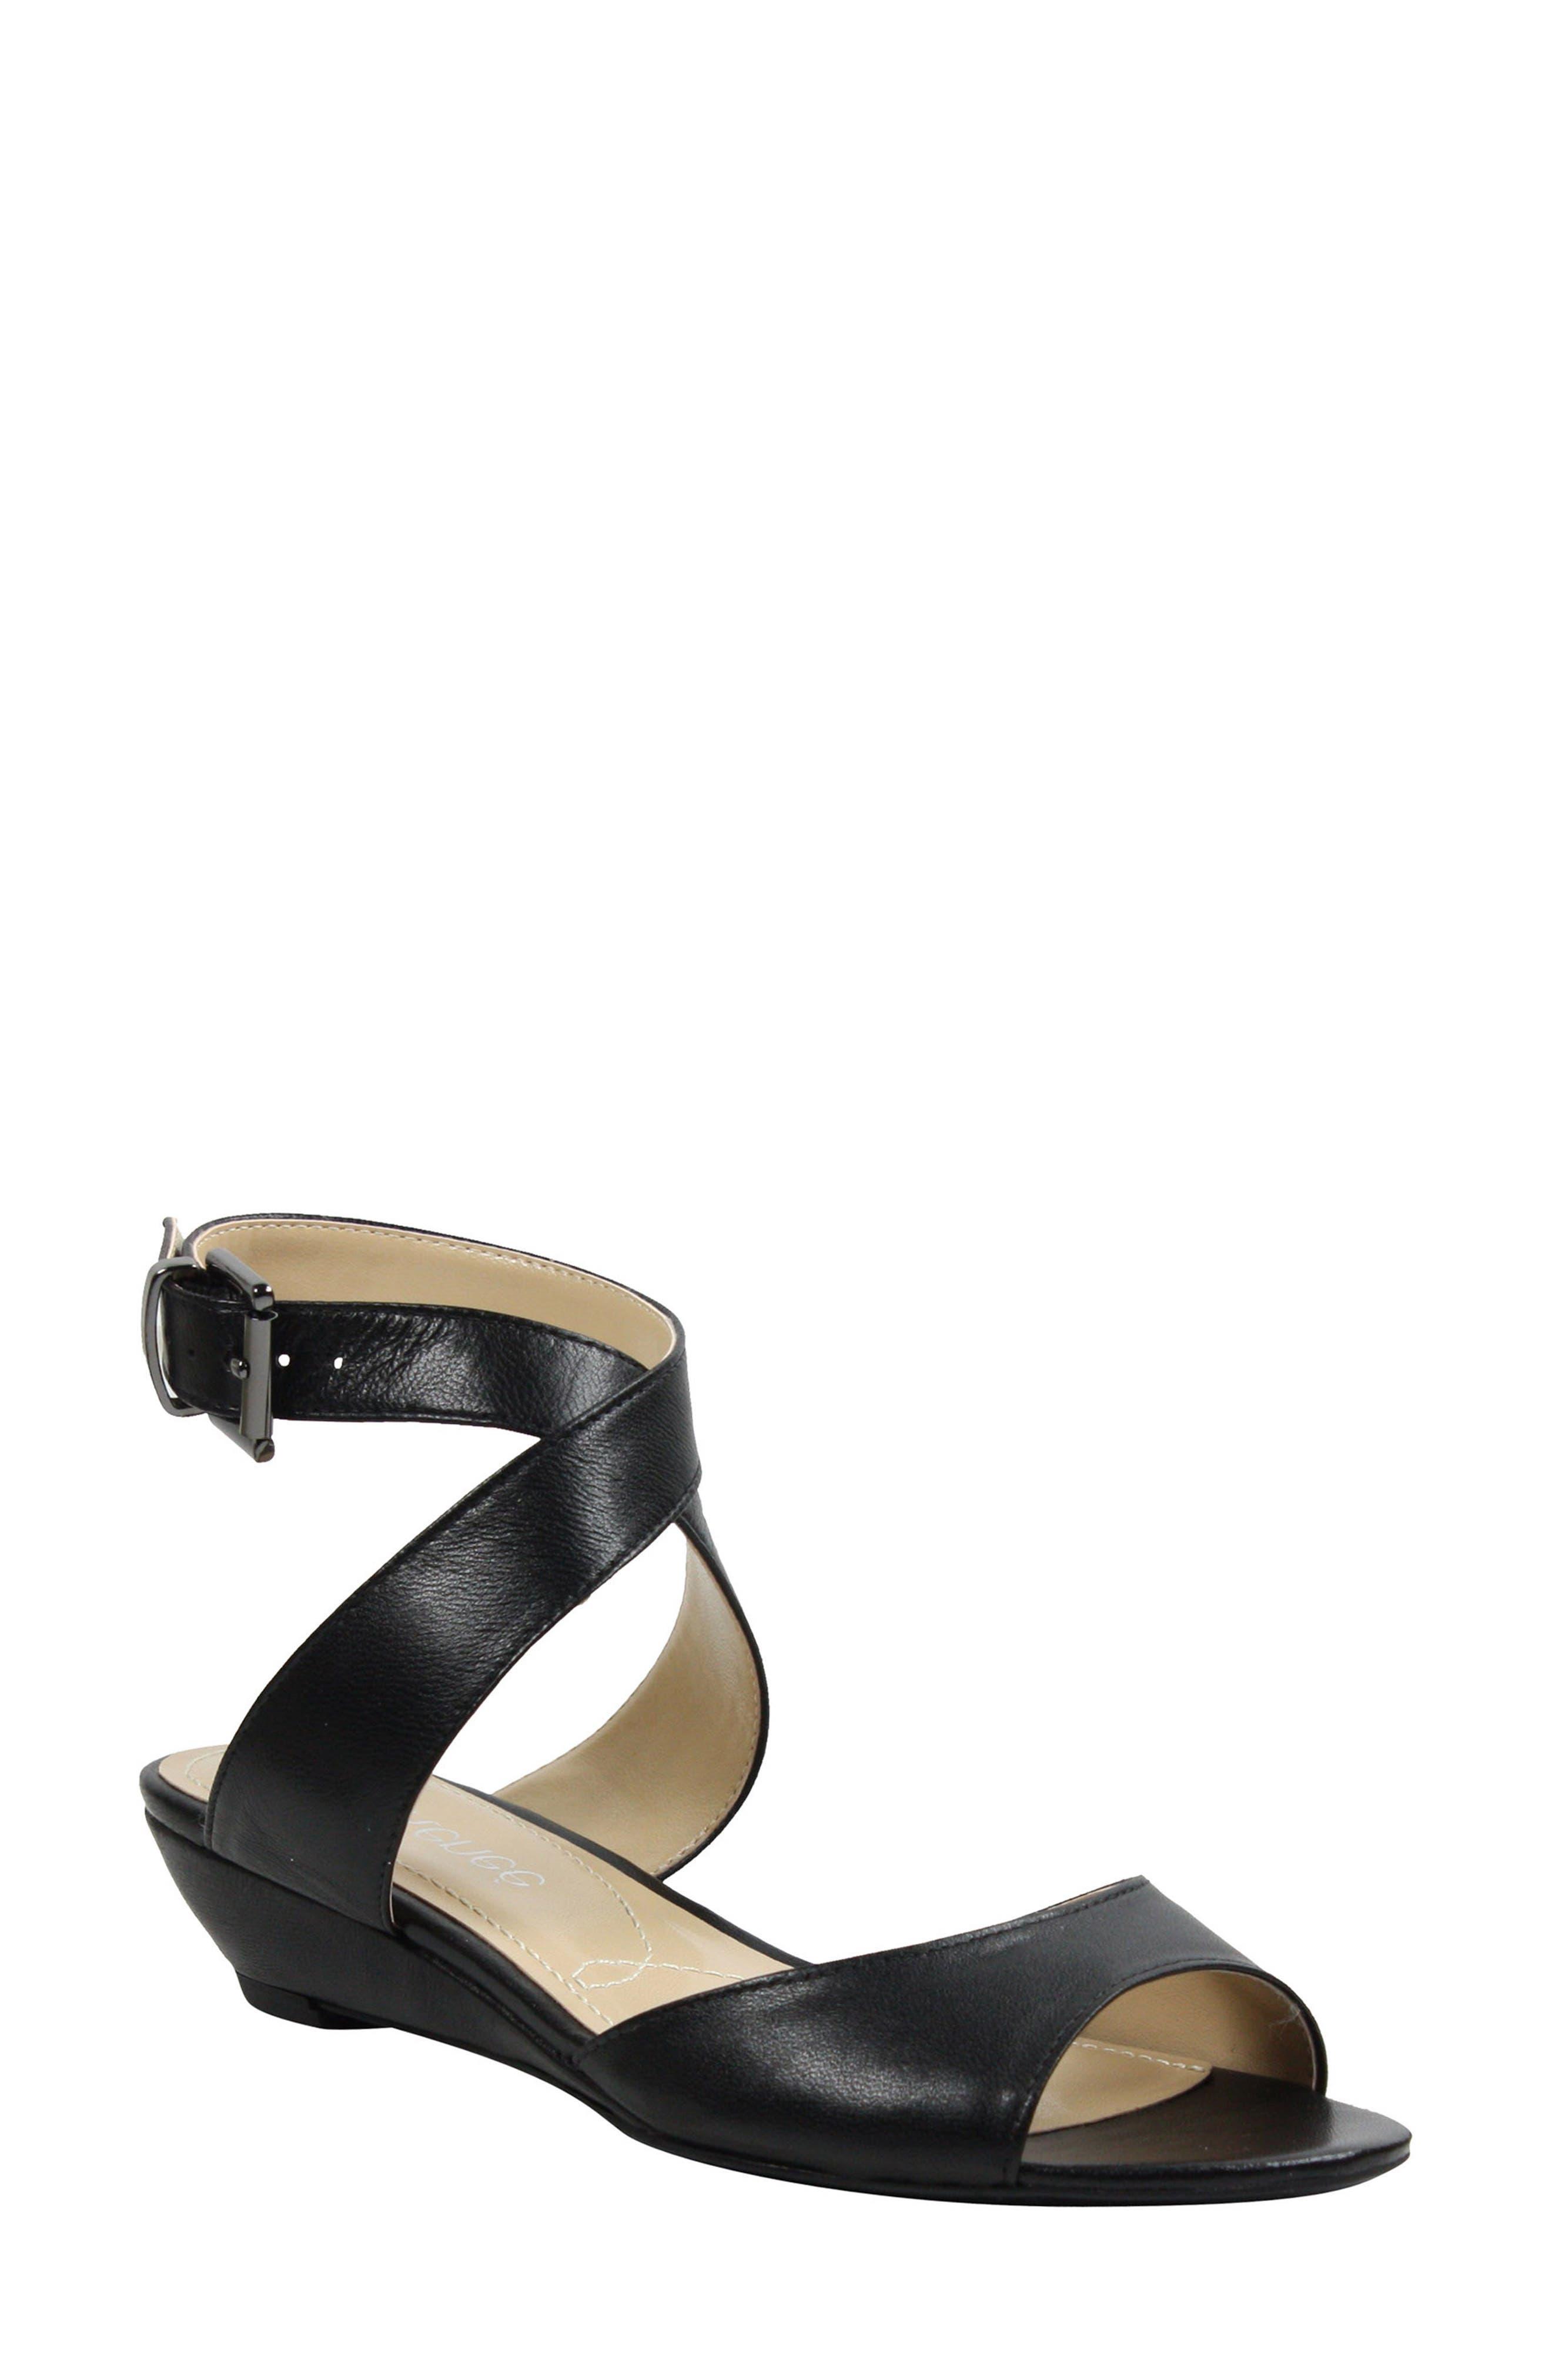 Belden Ankle Wrap Sandal, Main, color, BLACK LEATHER